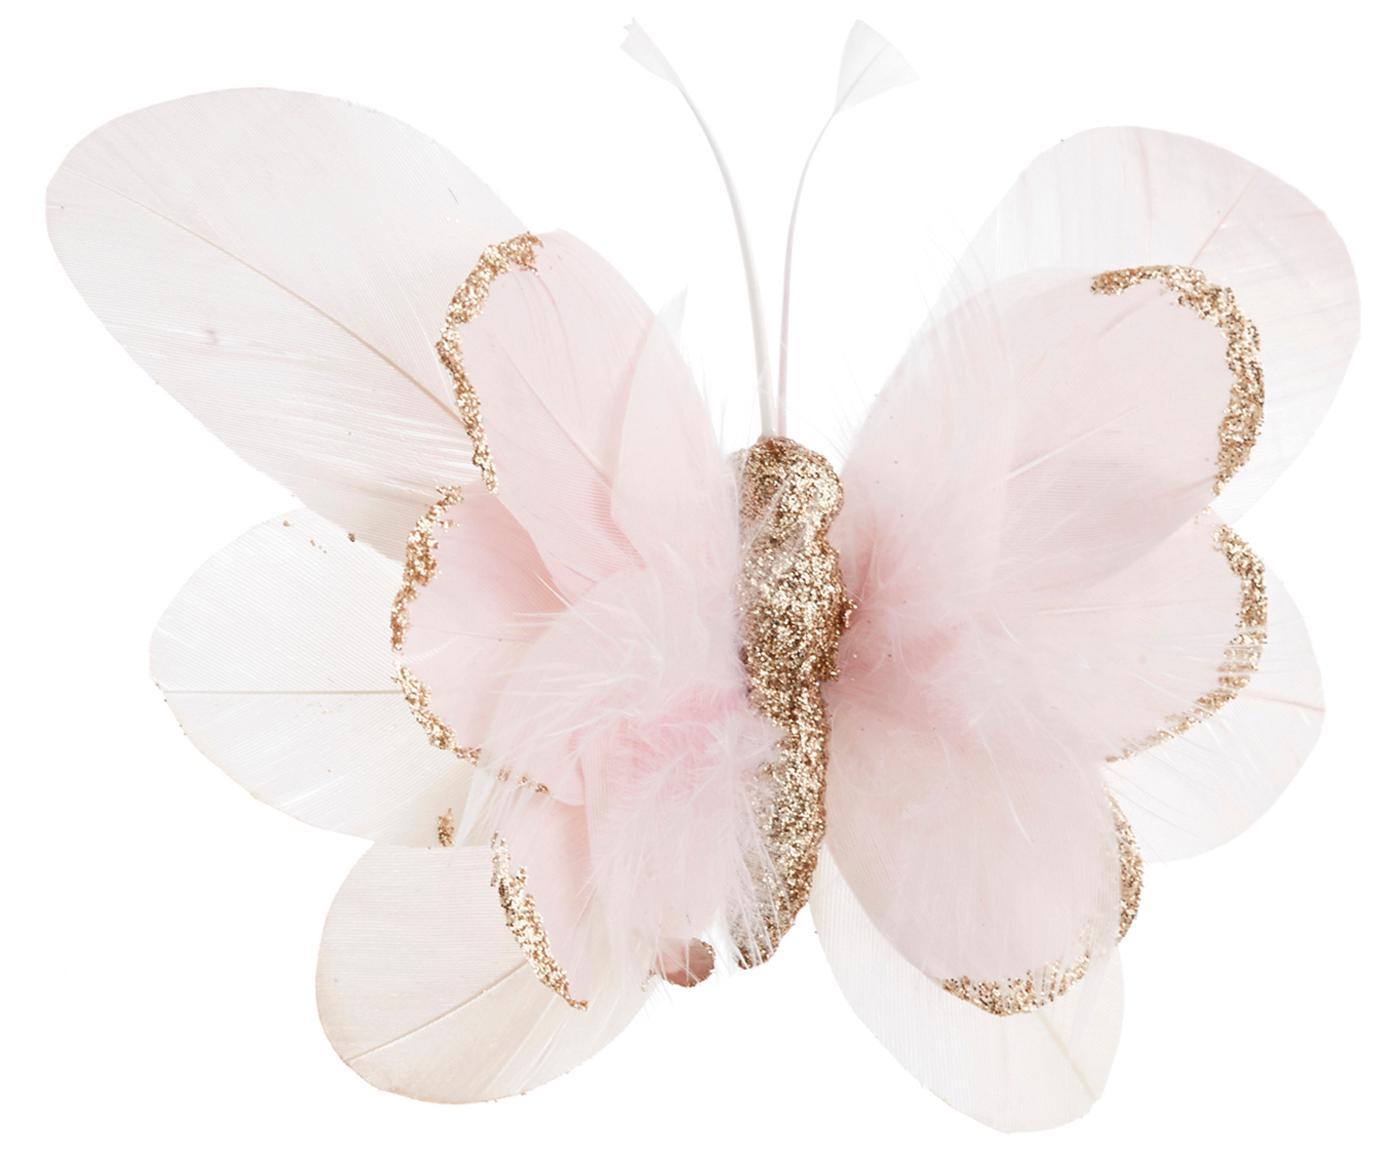 Kerstboomhanger Butterfly, 6 stuks, Roze, wit, goudkleurig, 14 x 3 cm